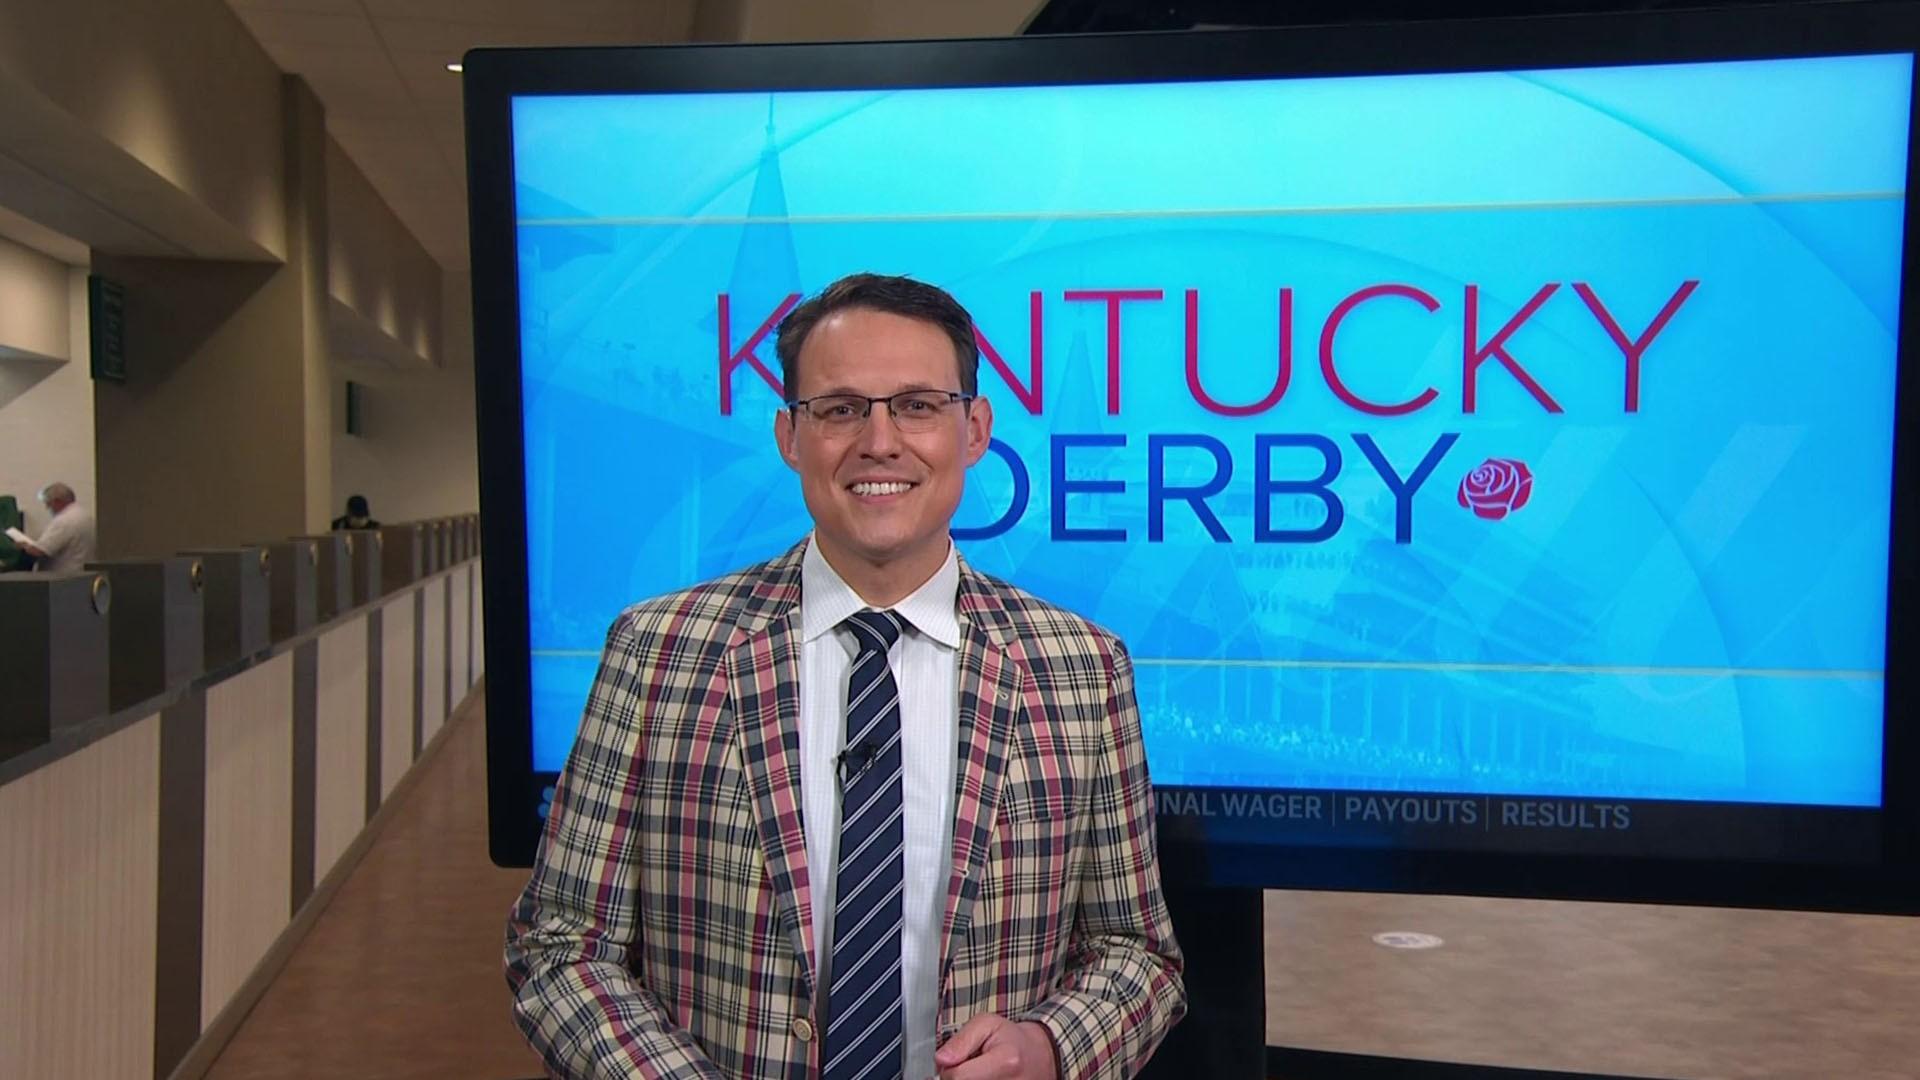 Gallery Steve Kornacki predicts Kentucky Derby winner is free HD wallpaper.